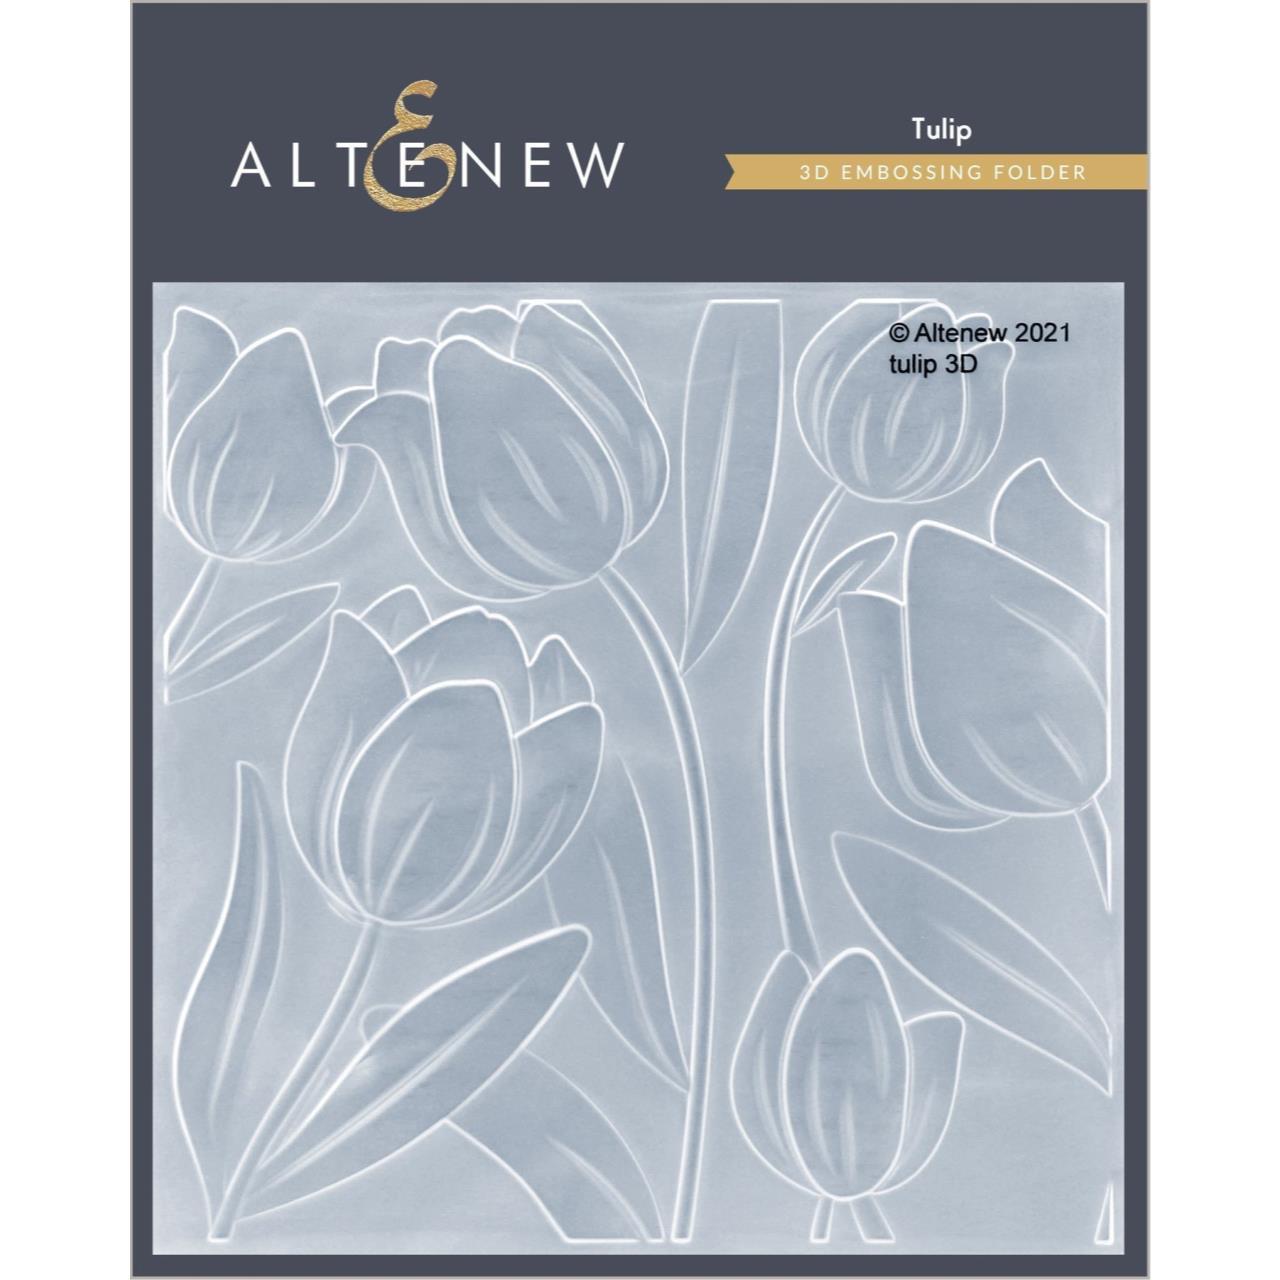 Tulip 3D, Altenew Embossing Folder -